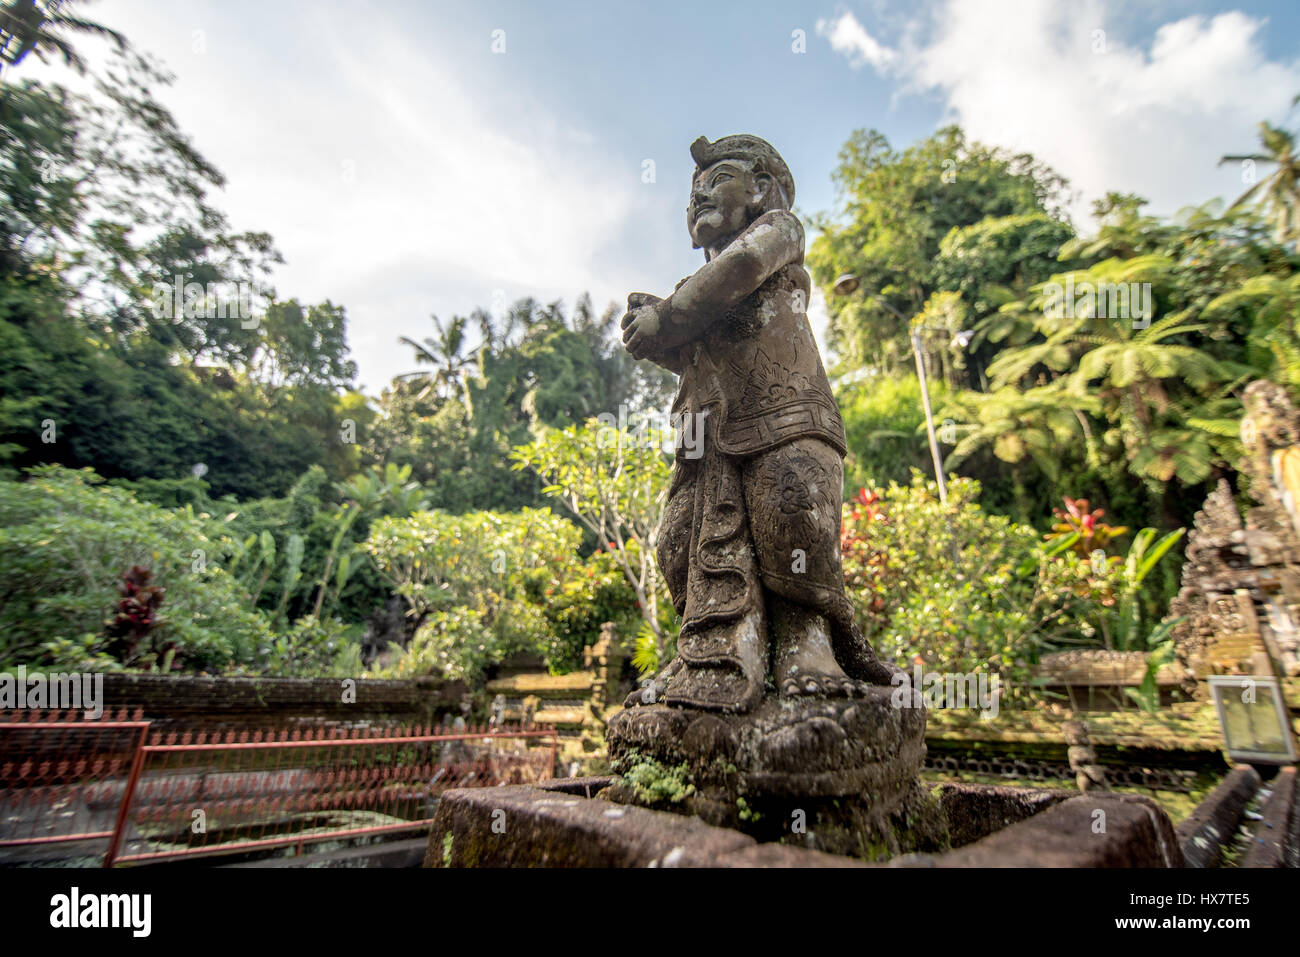 sculpture in Pura Tirta Empul, ubud temple, bali - Stock Image